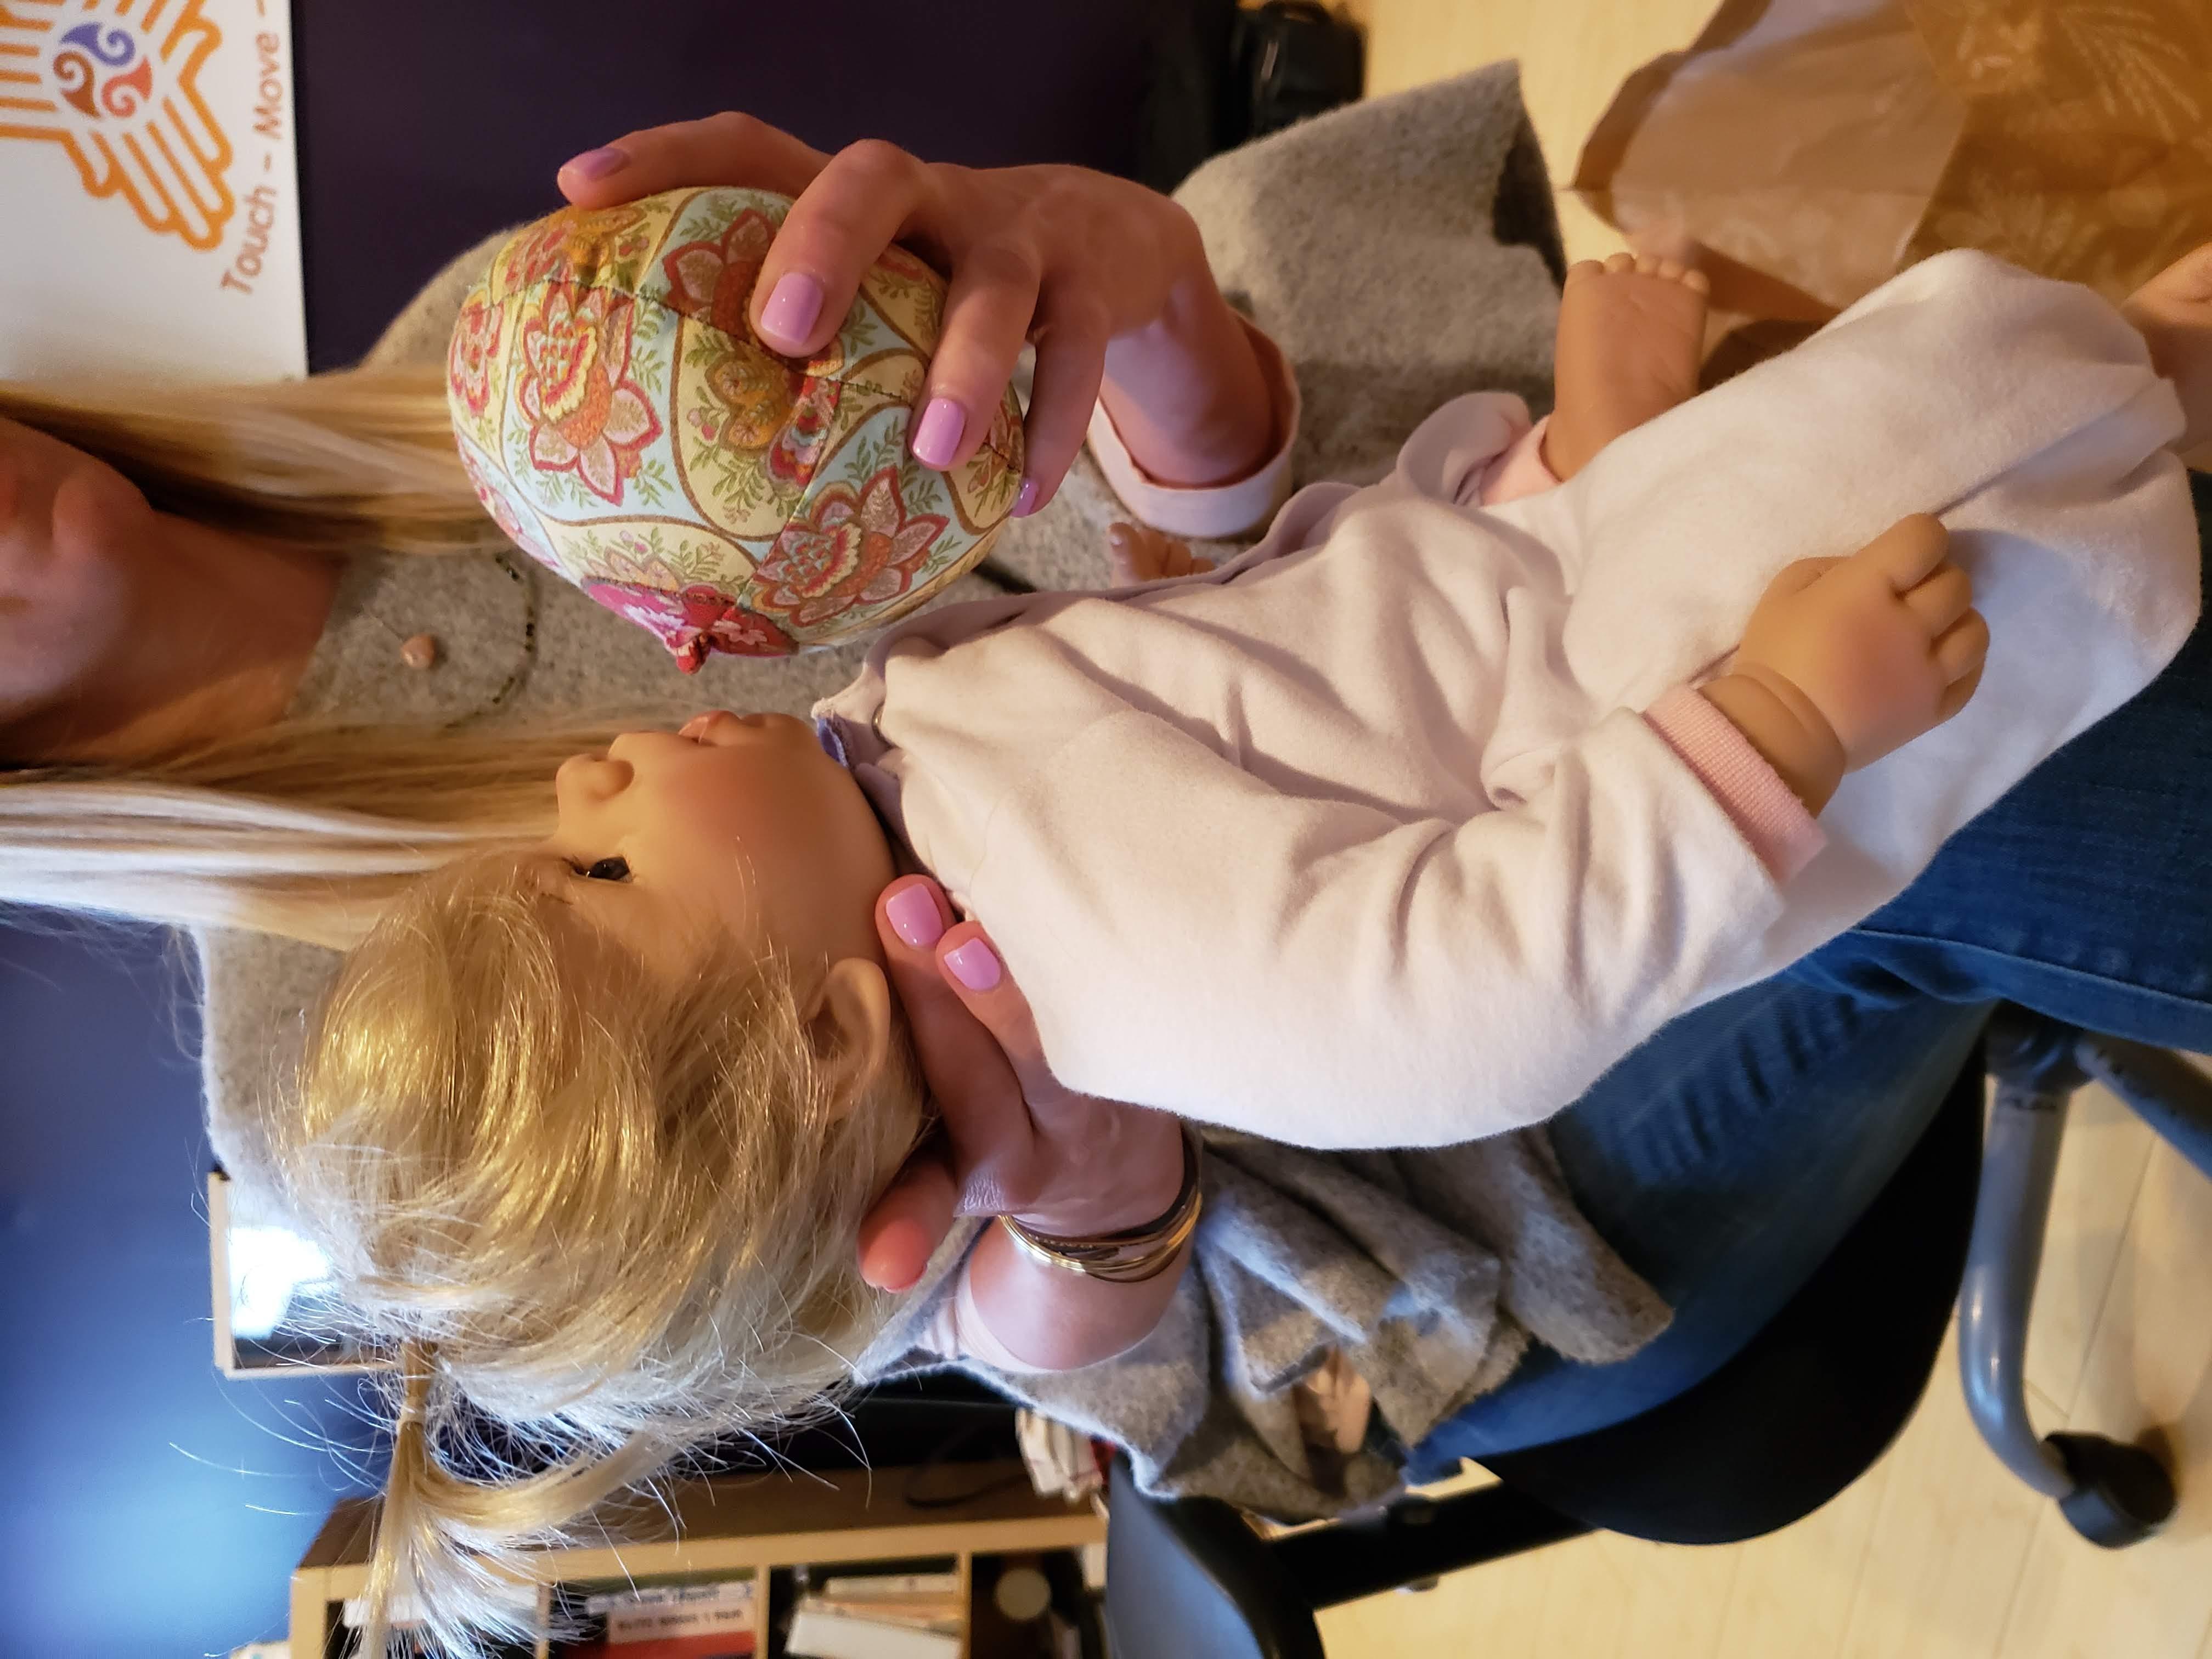 Lauren Miller birth doula